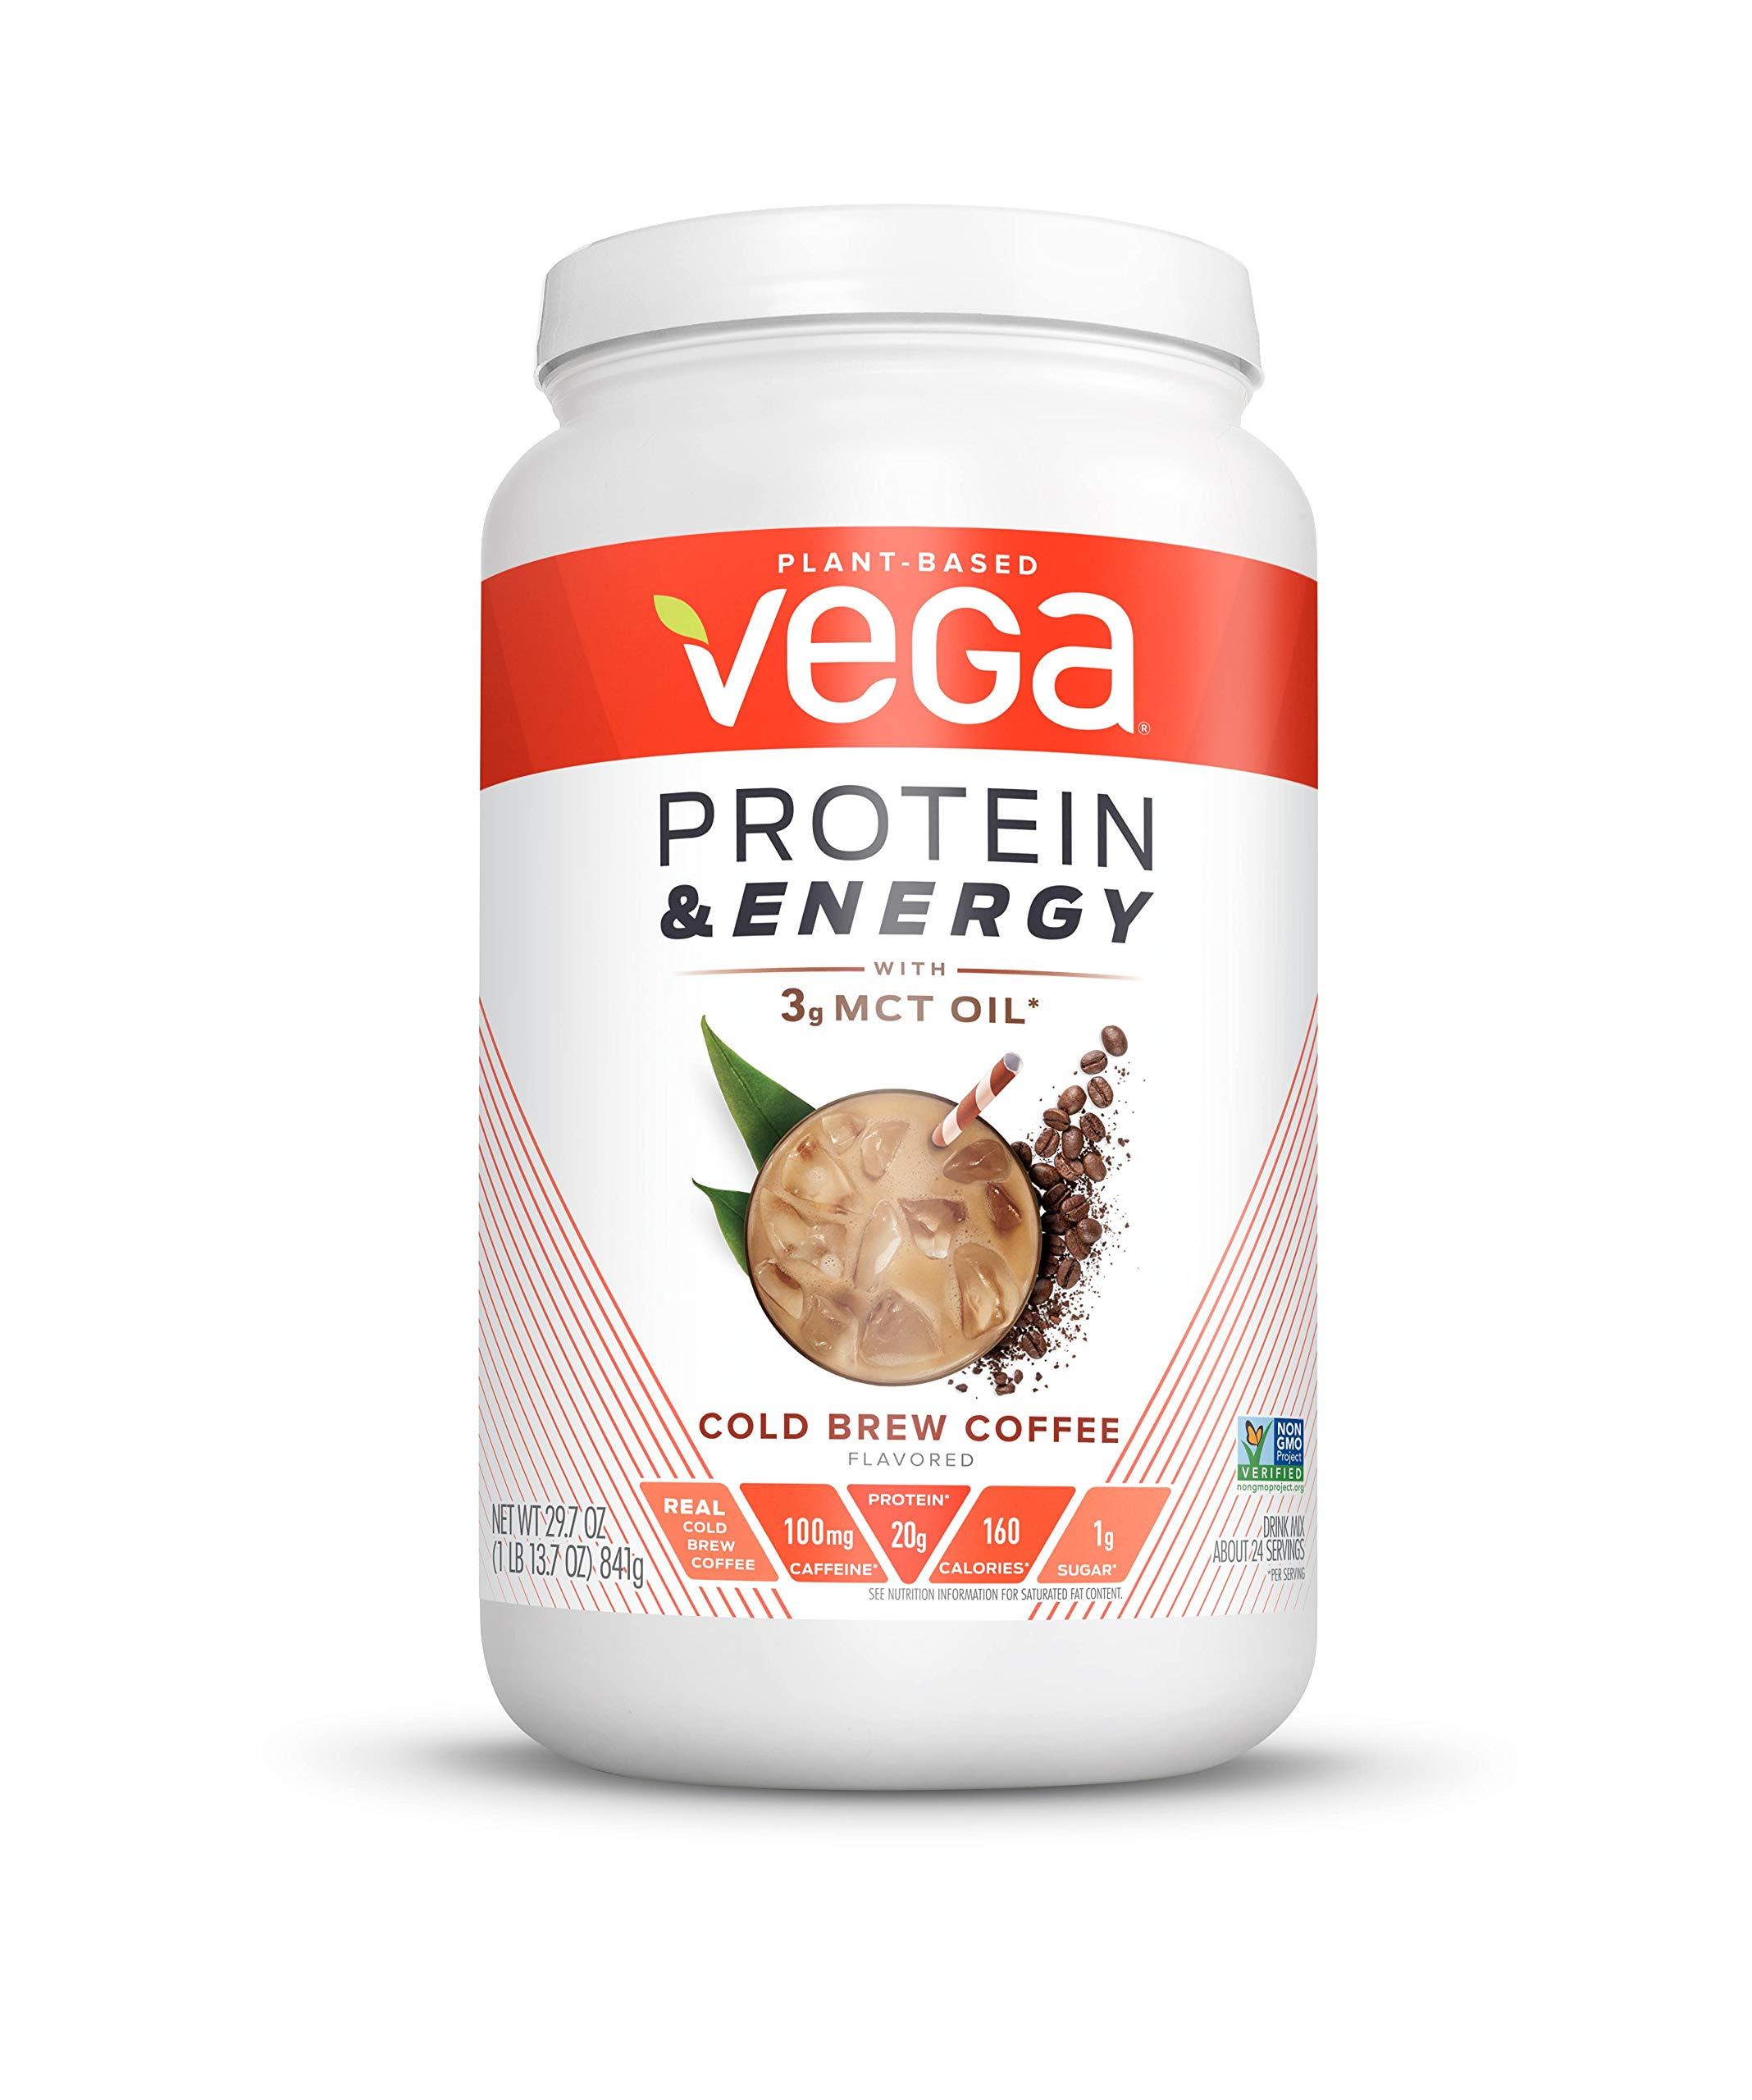 Vega Protein & Energy Cold Brew Coffee (24 servings, 29.7 Ounce (1 Count)) - Plant Based Vegan Non Dairy Protein Powder, Gluten Free, Keto, MCT oil, Non GMO by VEGA